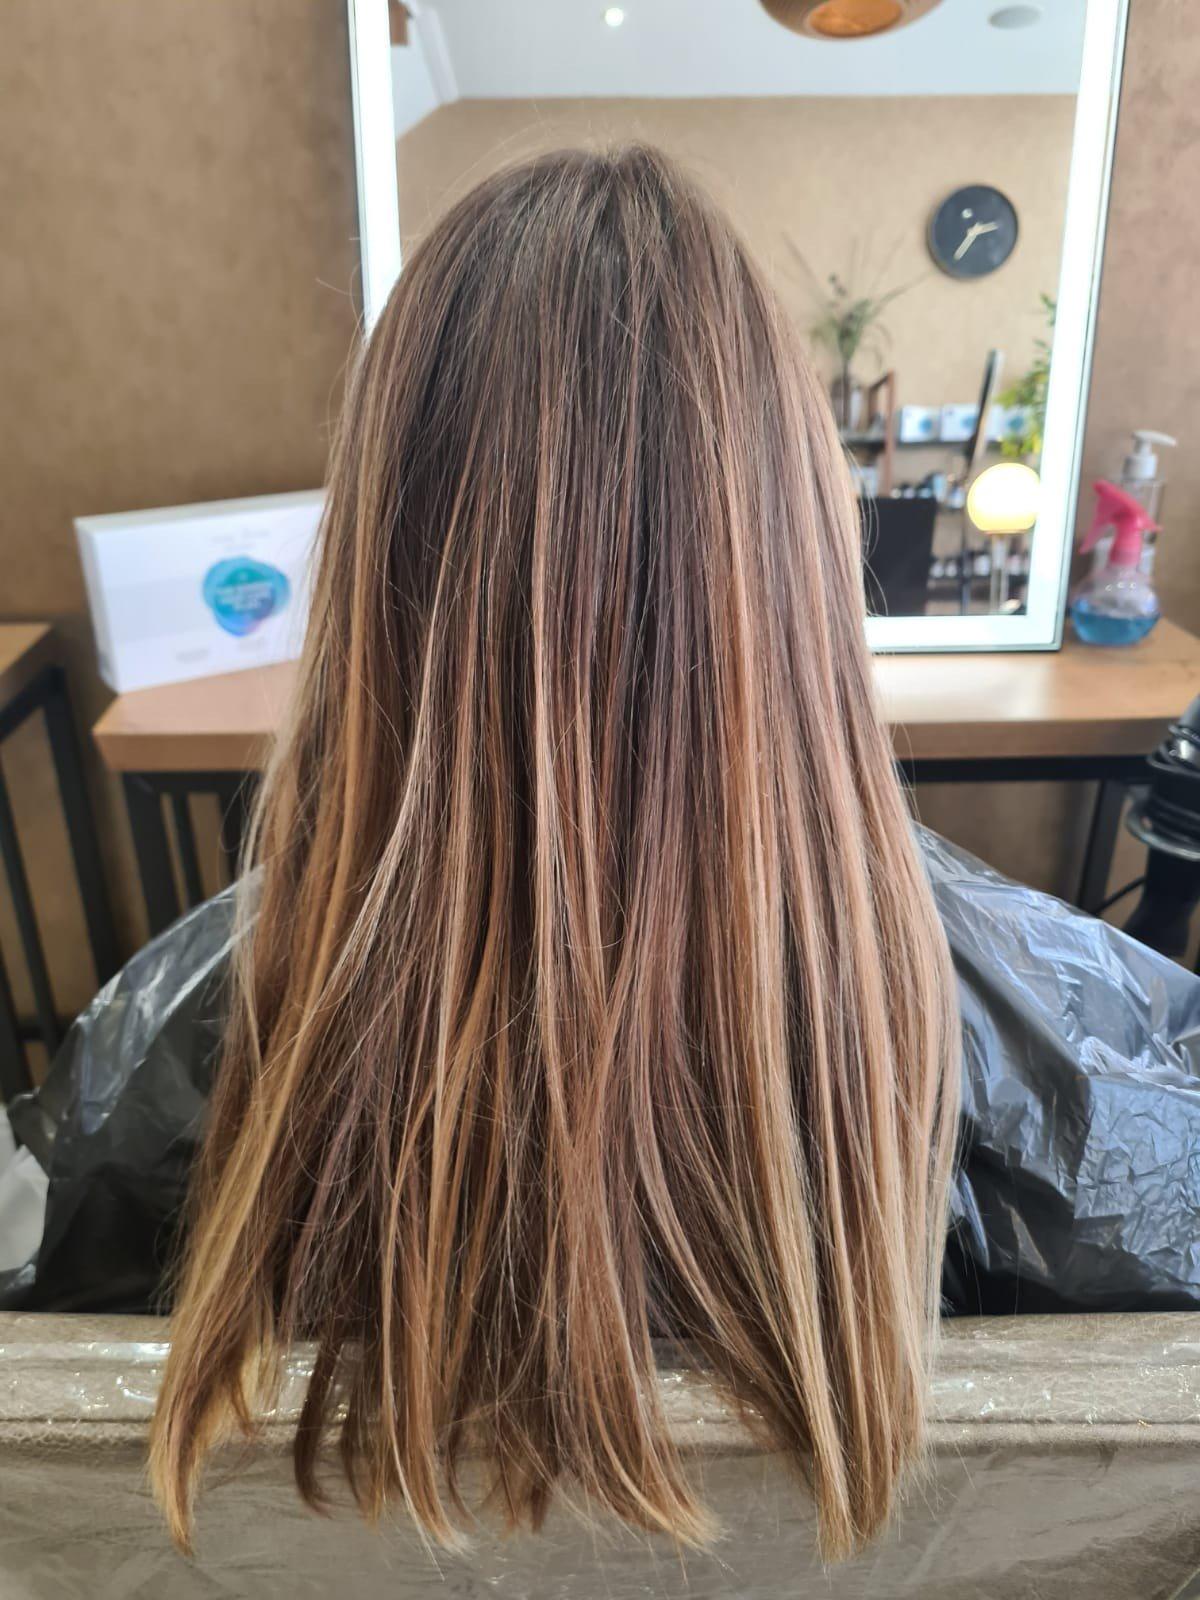 Olaplex hair colour transformation Bournemouth 1